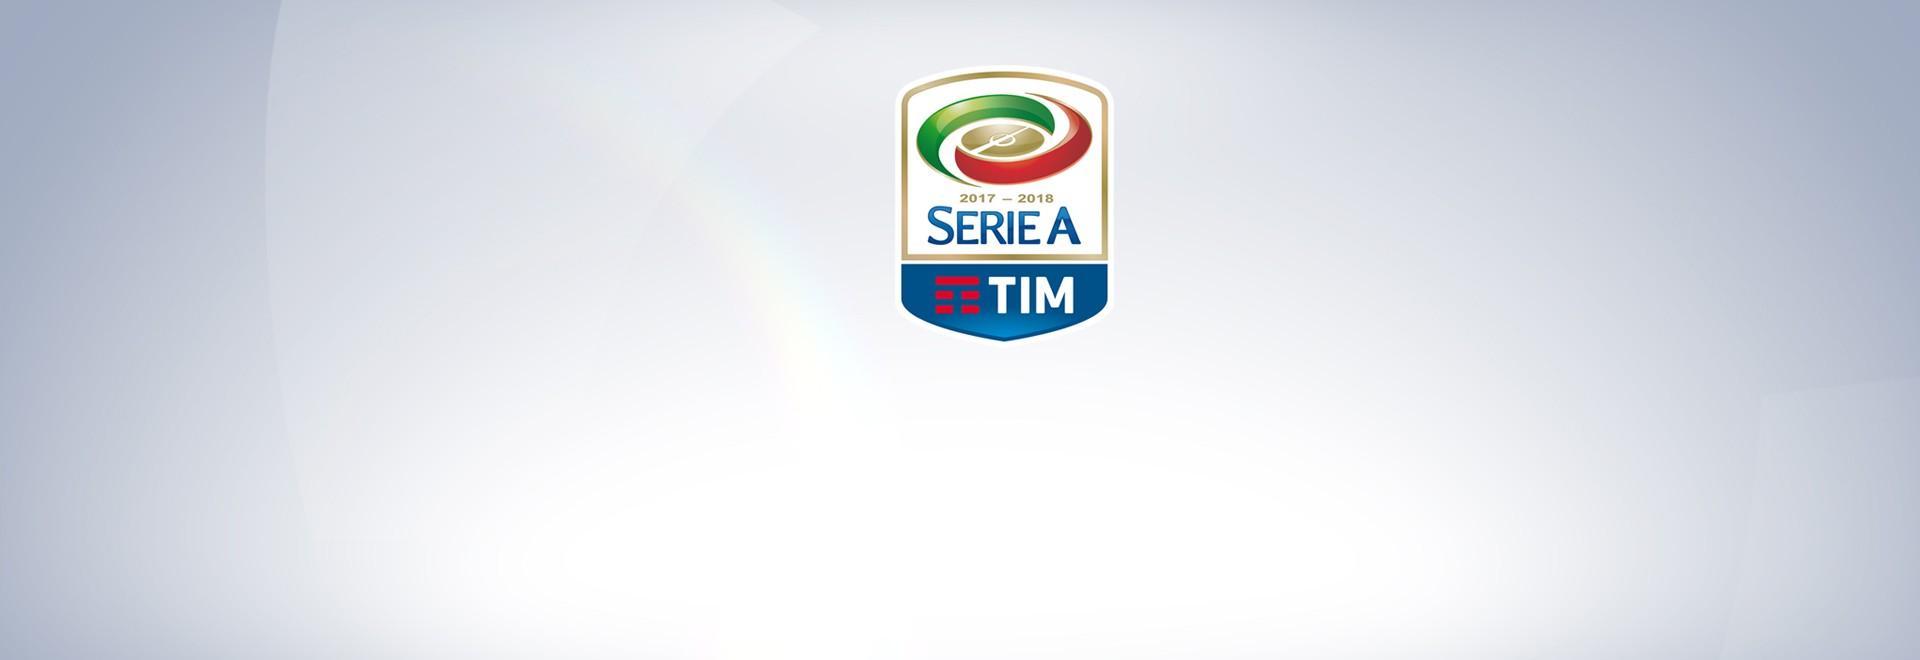 Sassuolo - Inter